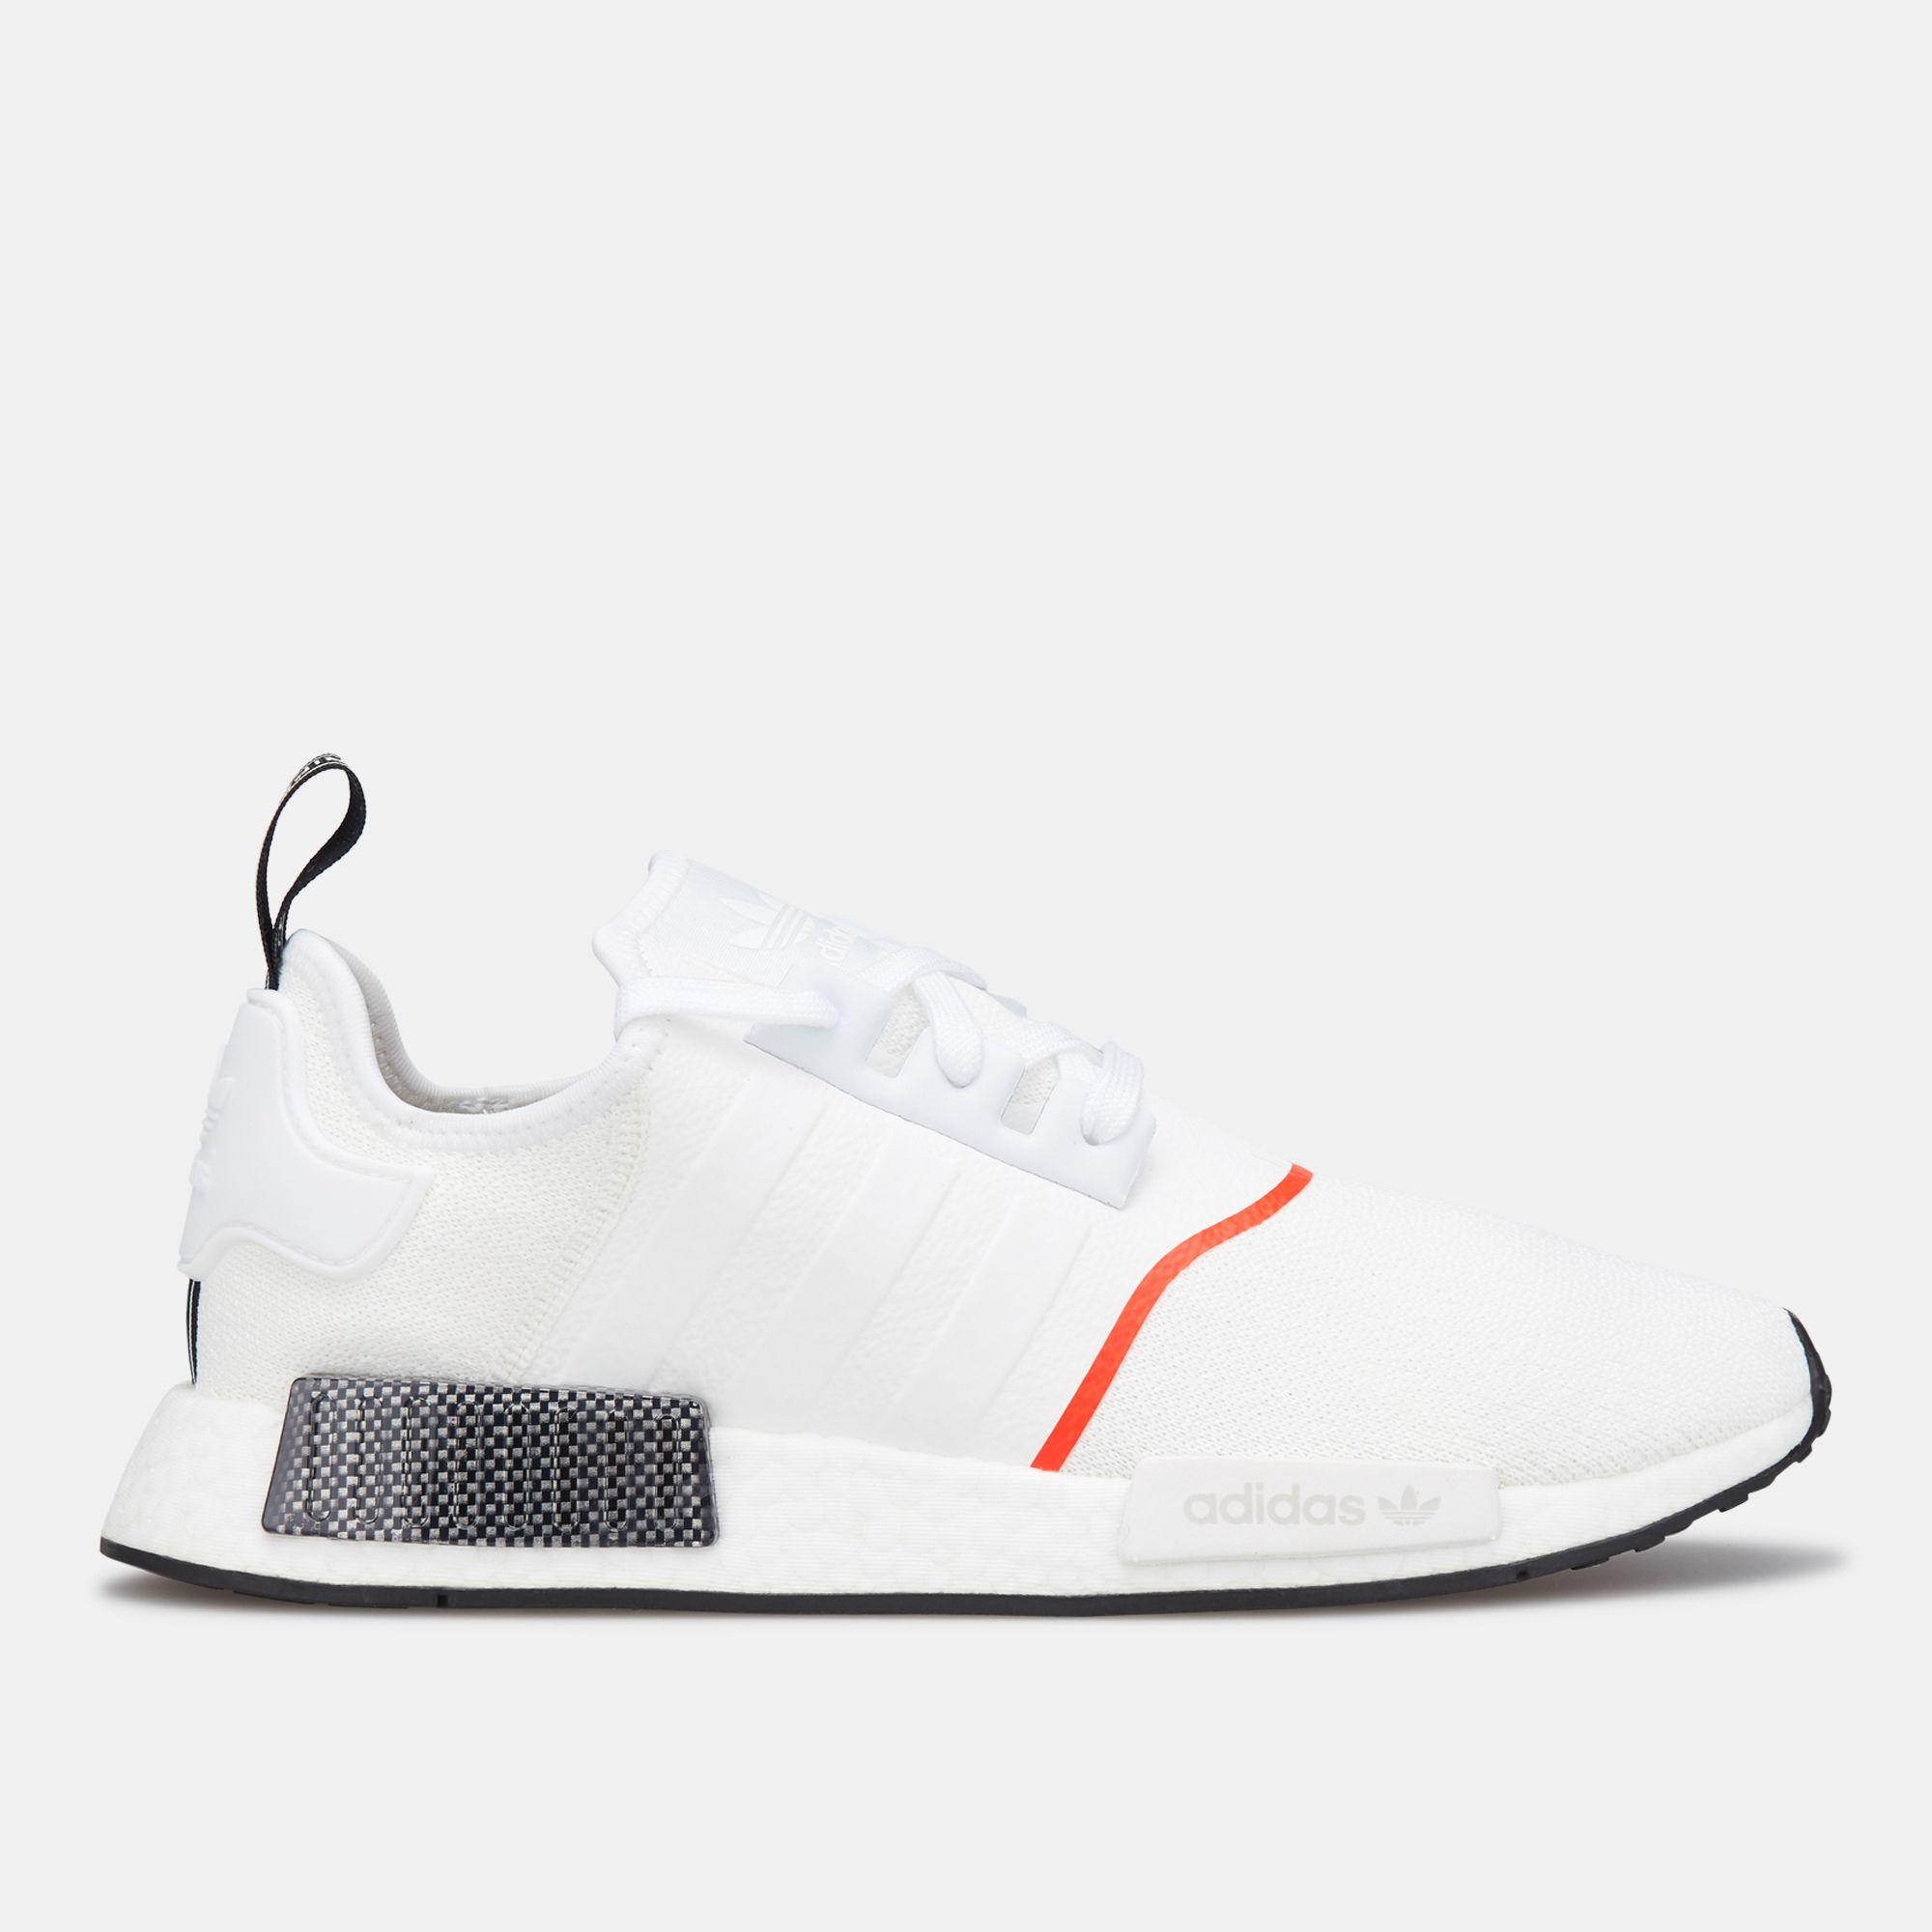 Adidas Originals Men S Nmd R1 Shoe Sneakers Shoes Men S Sale